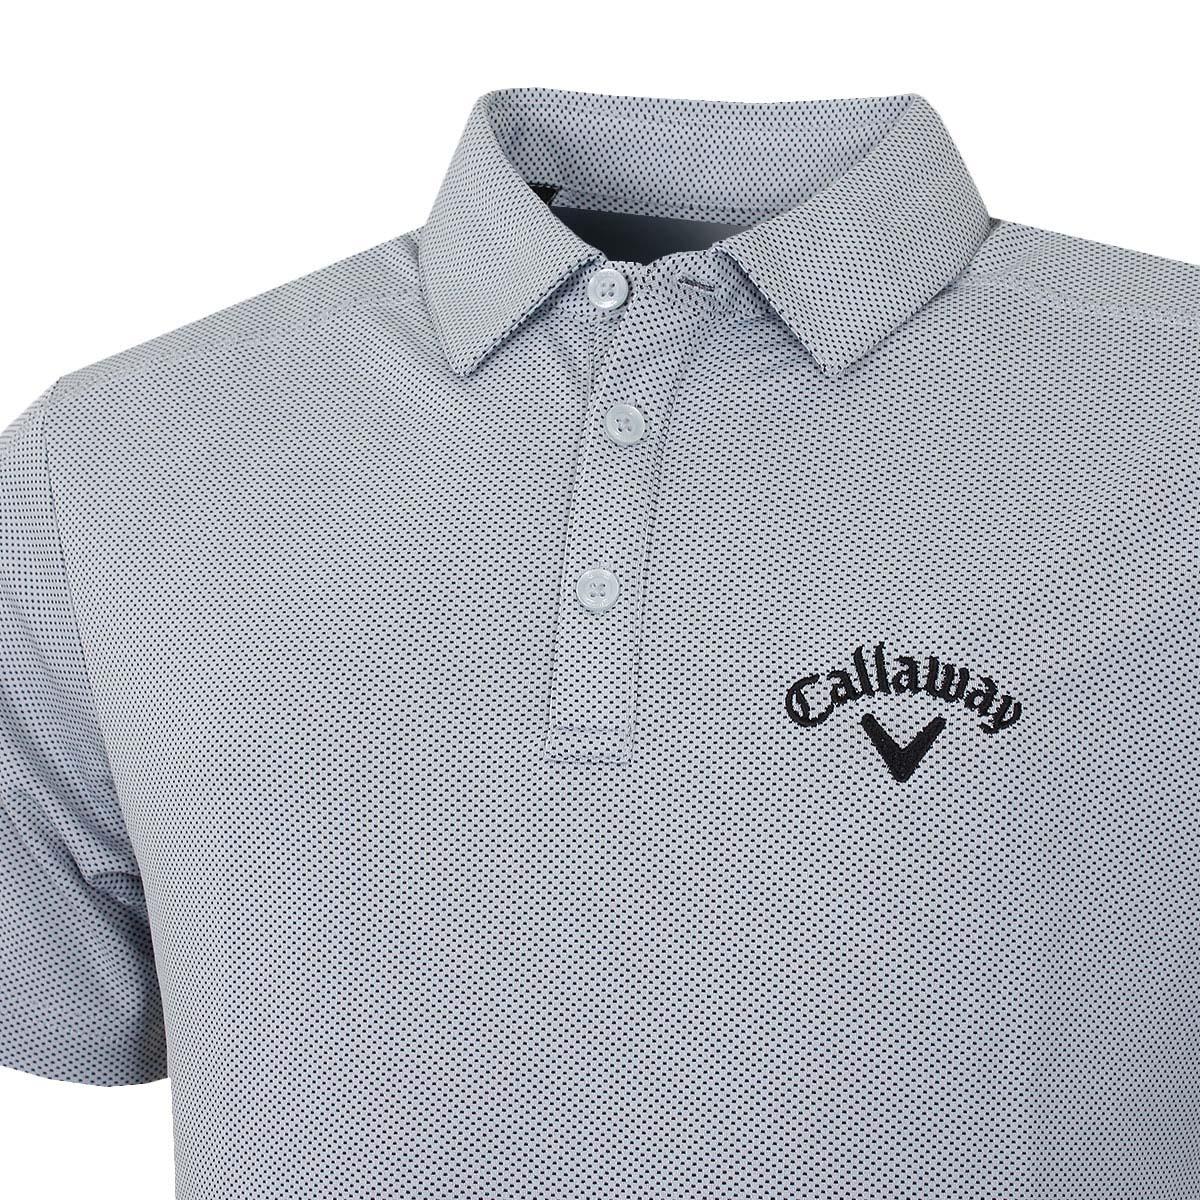 Callaway-Mens-New-Box-Jacquard-Tour-Opti-Dri-Golf-Polo-Shirt-45-OFF-RRP thumbnail 7